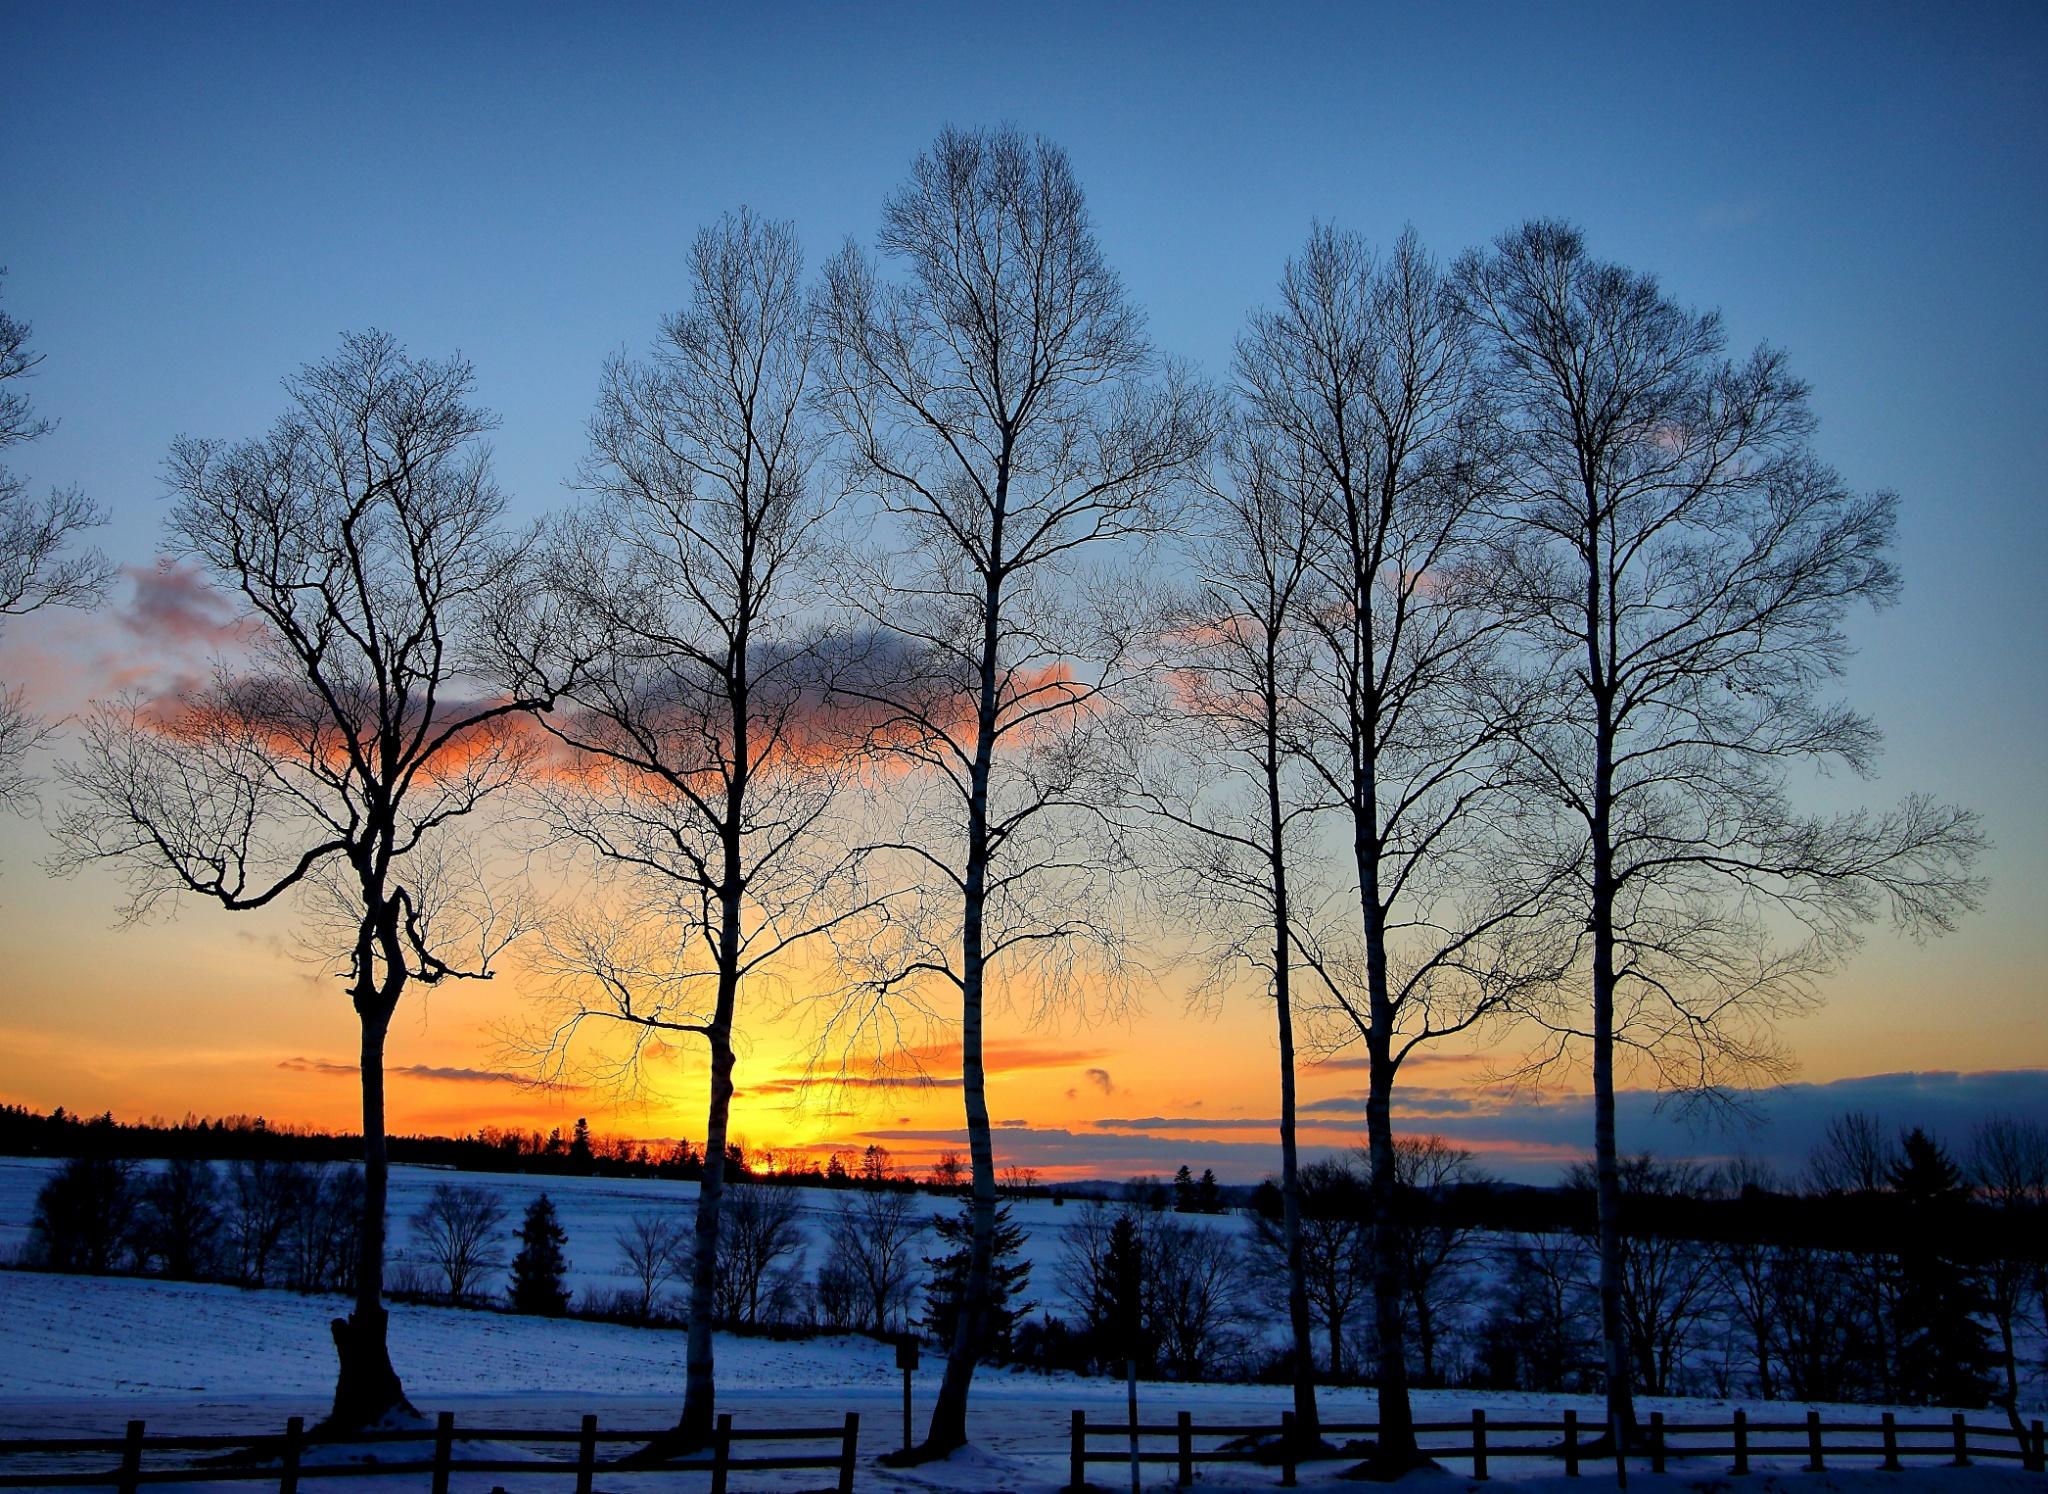 Hokkaido, Japan - A Photojournal And Story Of Raw Natural Beauty